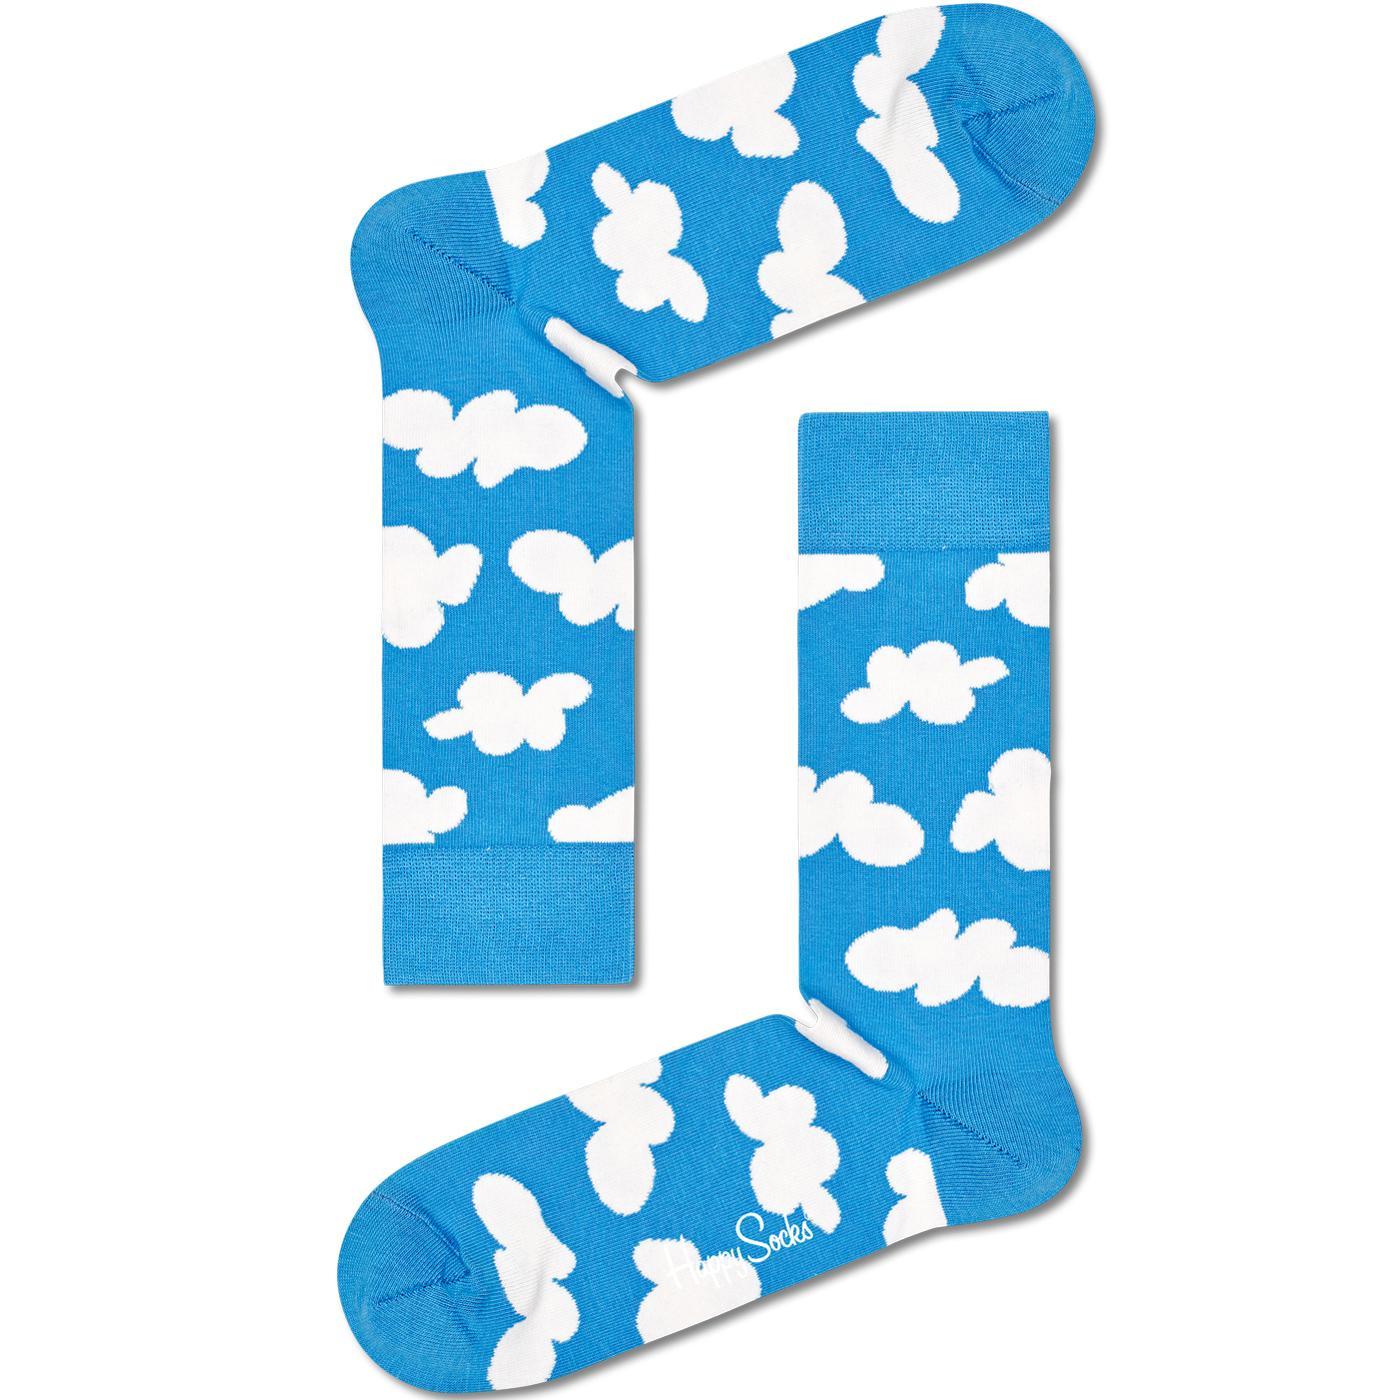 + Cloudy HAPPY SOCKS Retro Cloud Socks (Blue)